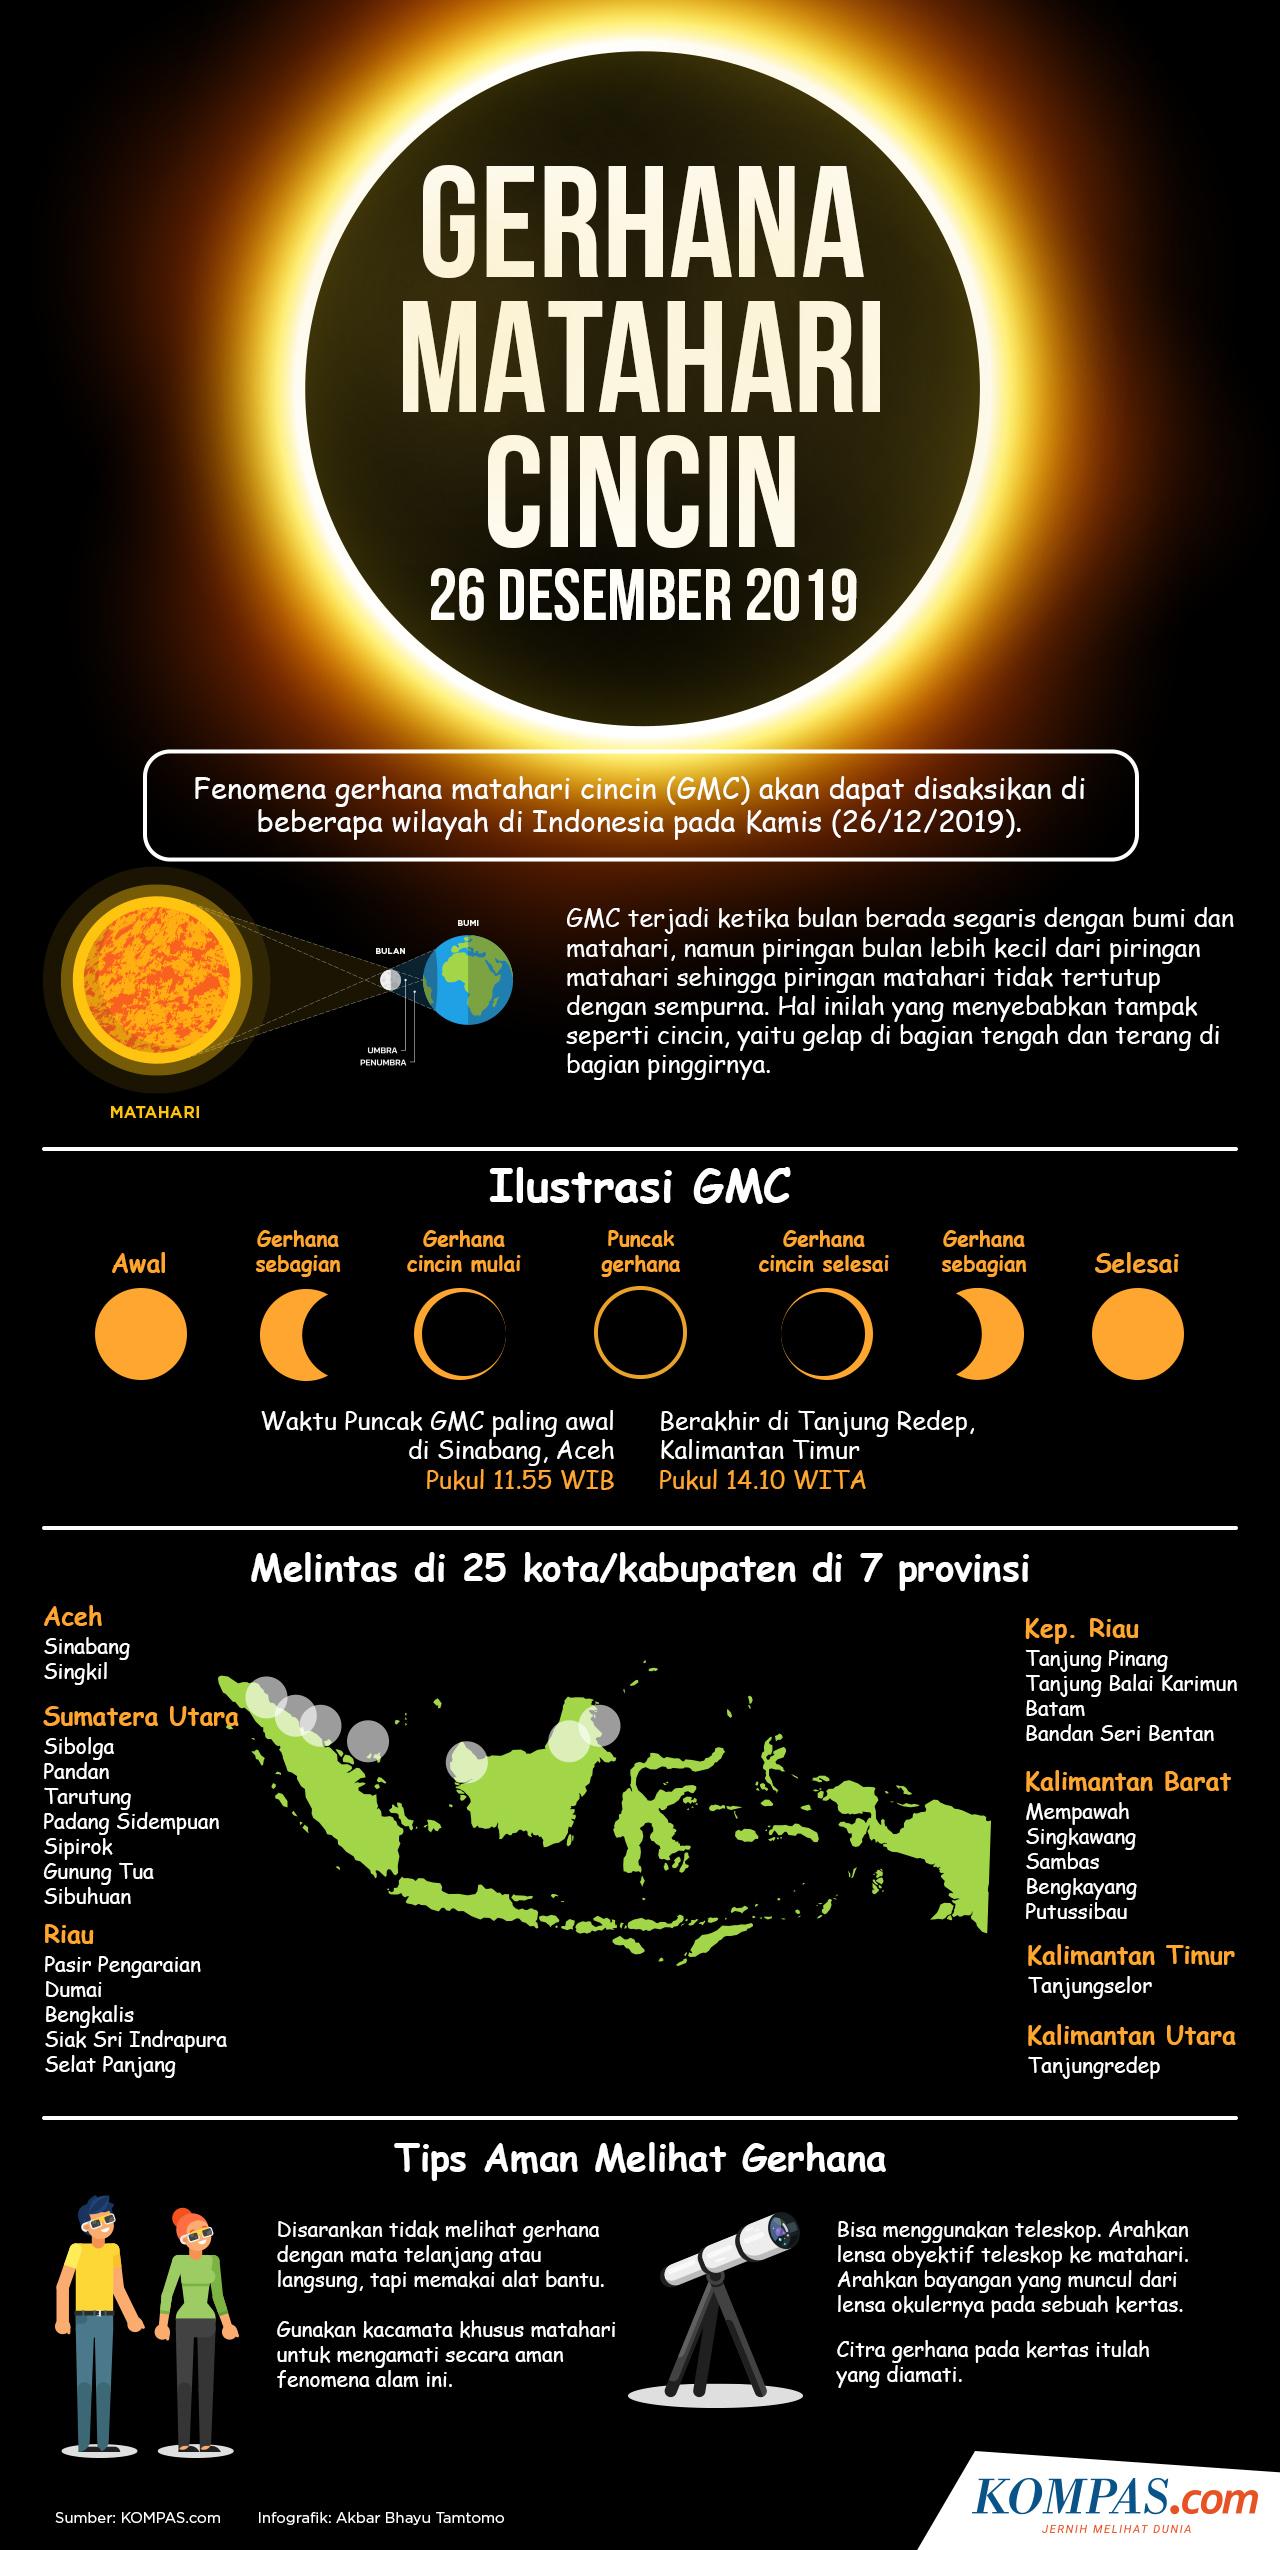 Jadi Lokasi Paling Tepat Pantau Gerhana Matahari Cincin